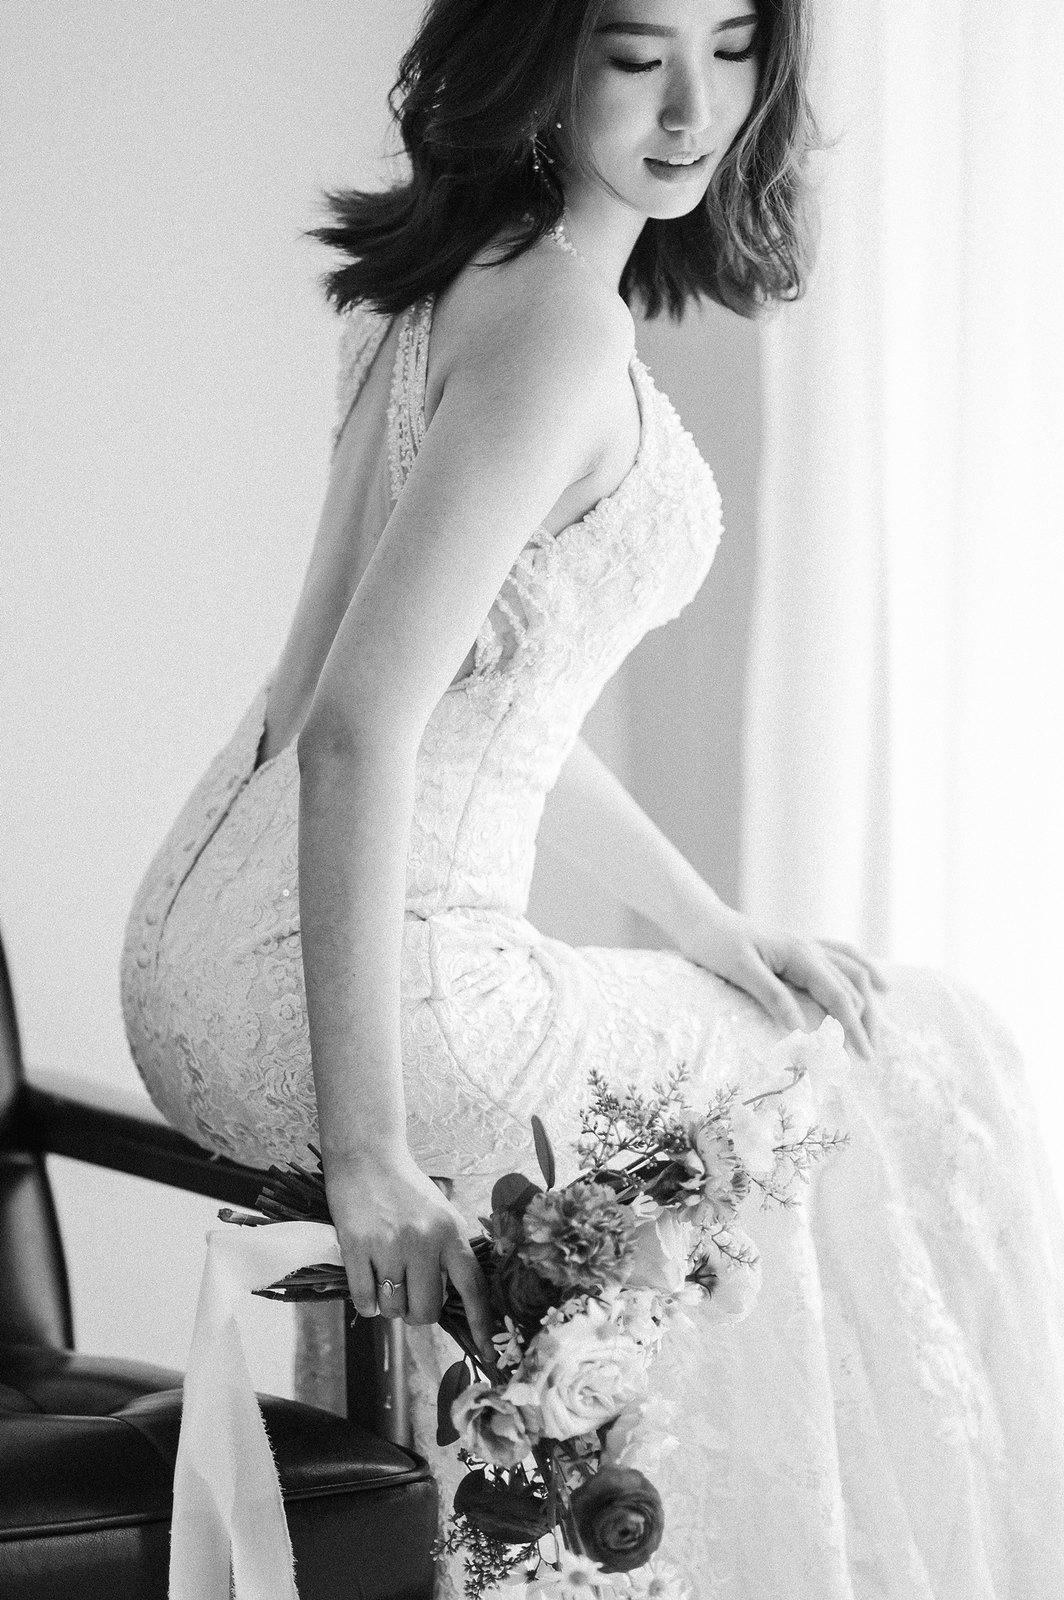 【婚紗】Zoe / 婚紗意象 / KACHA Studio / EASTERN WEDDING